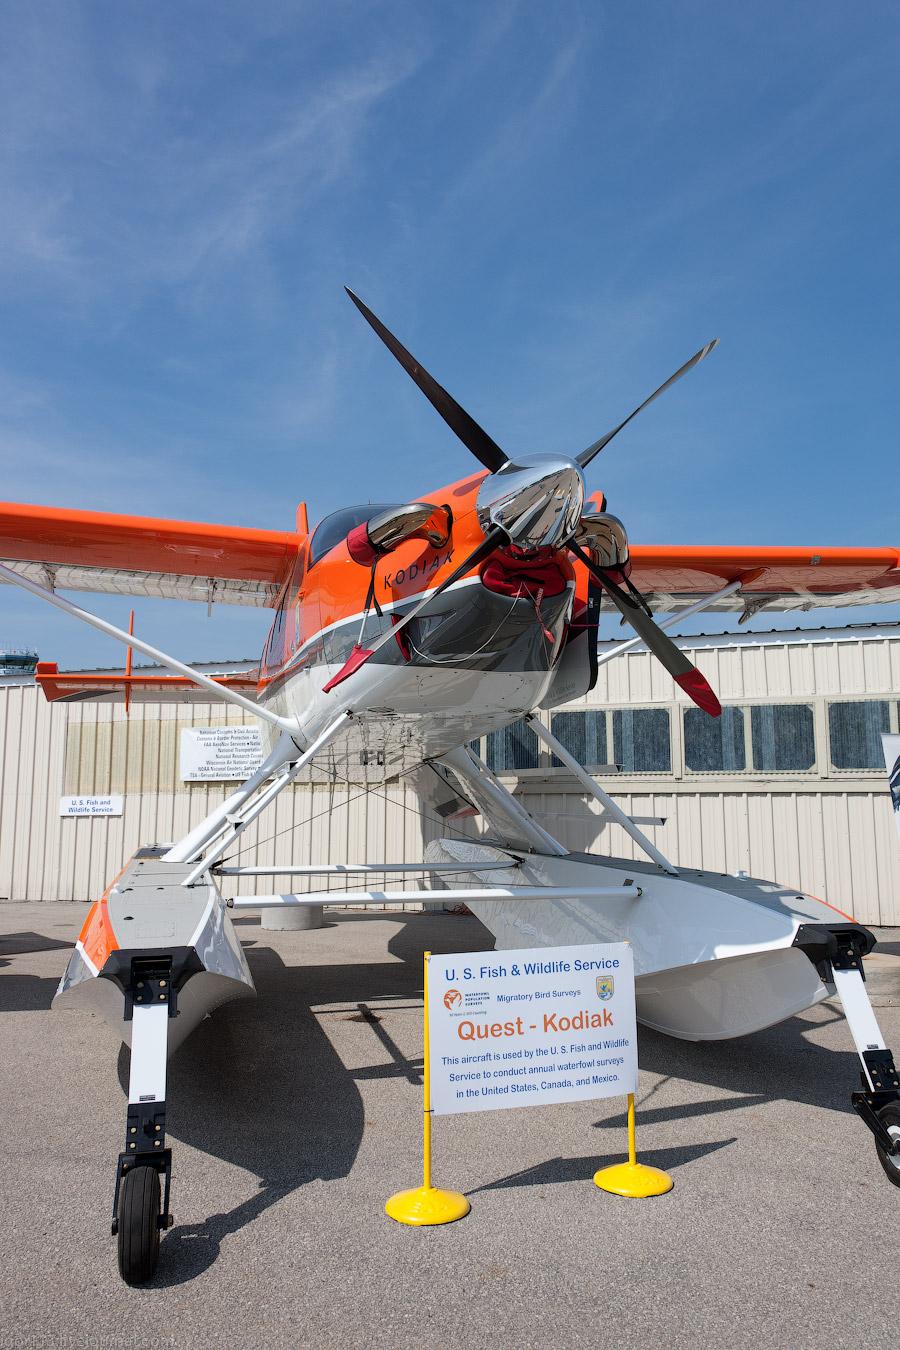 Meet The Kodiak Advanced STOL Turboprop